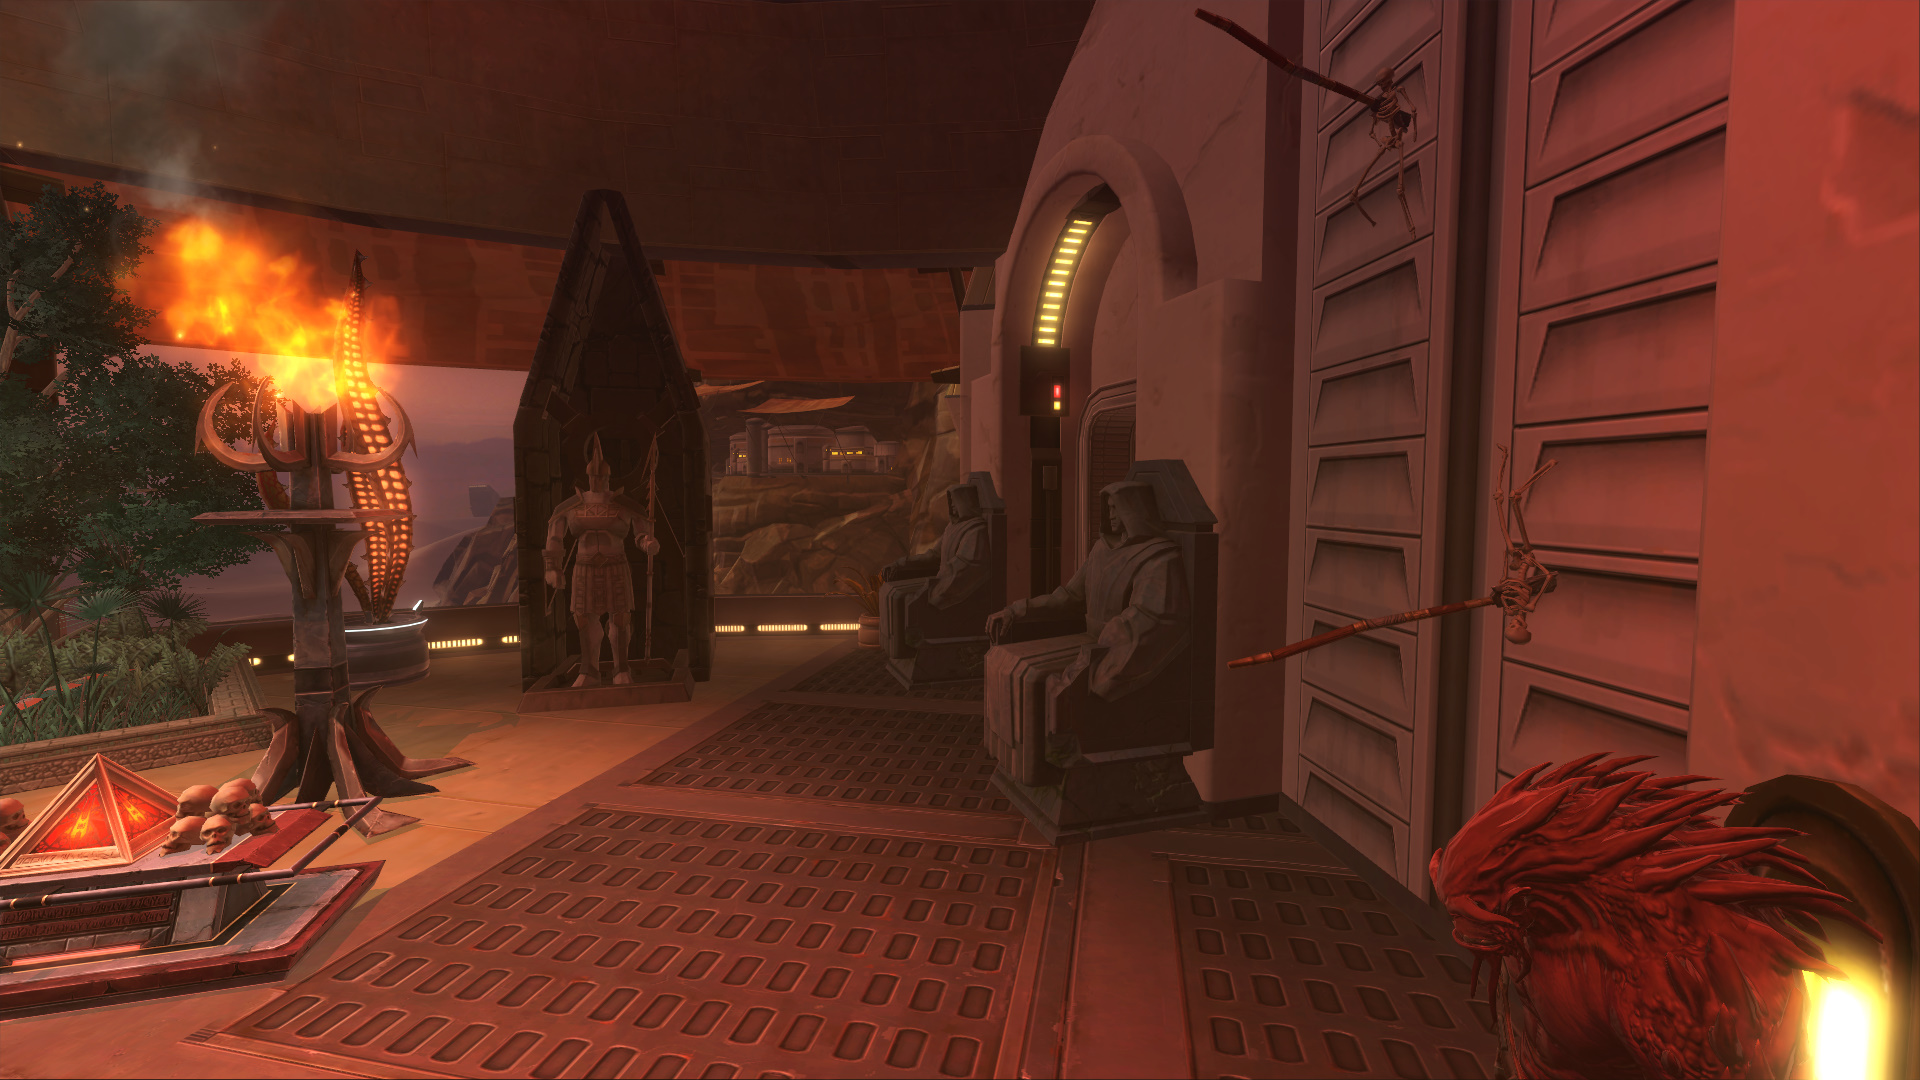 Zar'thon Trade Emporium – The Ebon Hawk